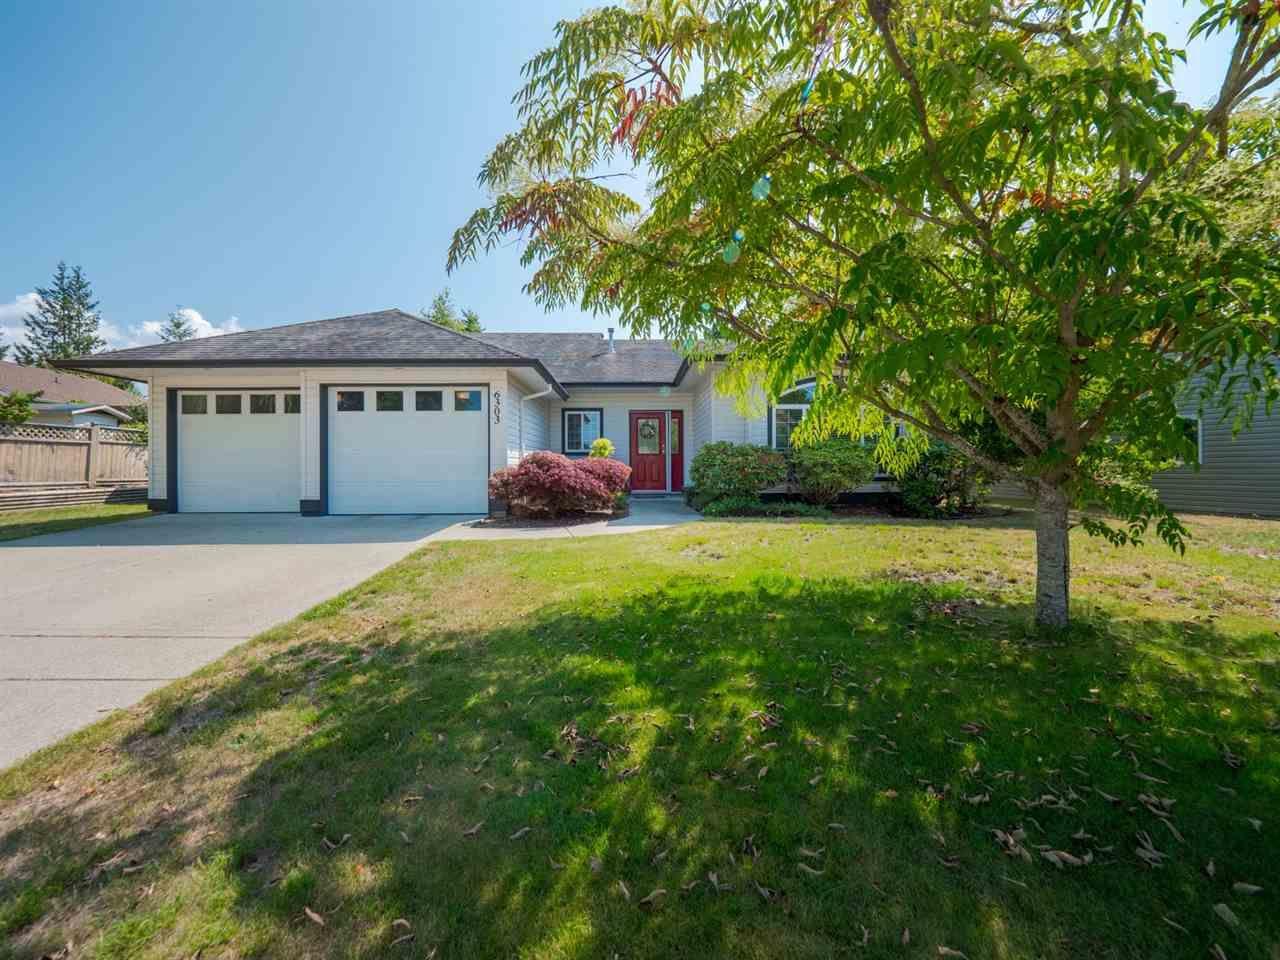 Main Photo: 6303 HOMESTEAD Avenue in Sechelt: Sechelt District House for sale (Sunshine Coast)  : MLS®# R2394293